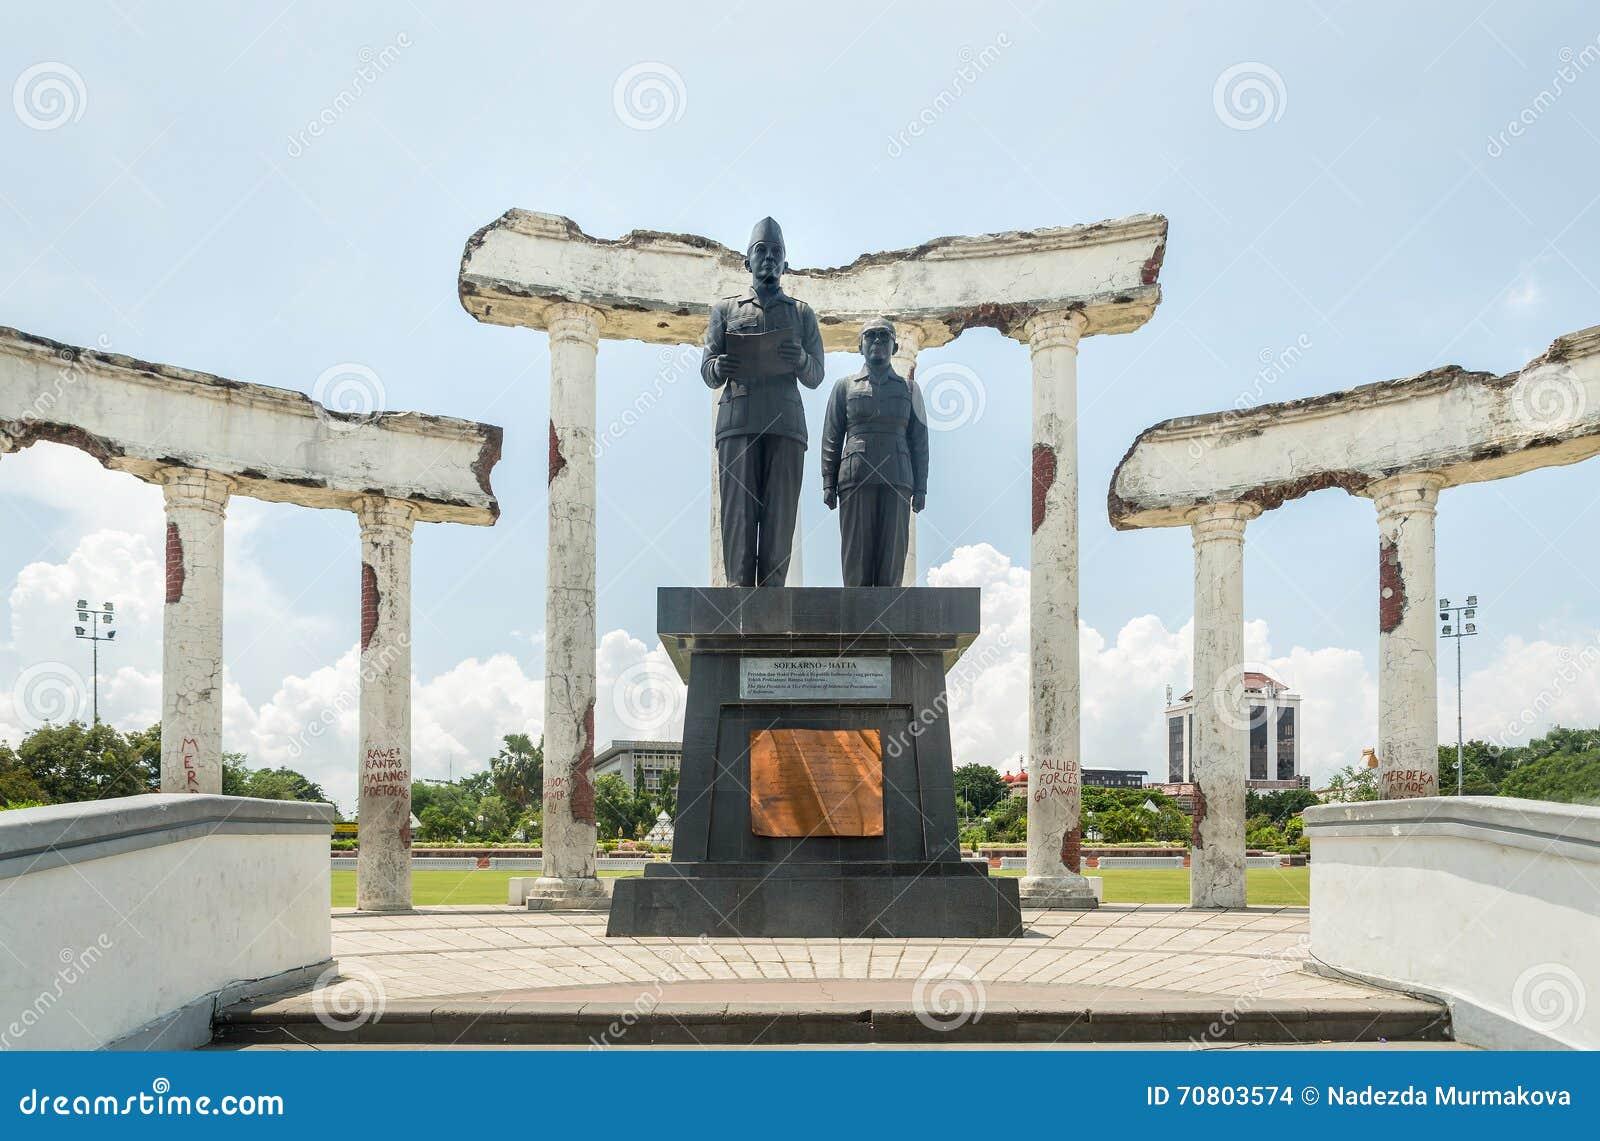 Proklamationsstatue in den Ruinen, Museum Tugu Pahlawan in Surabaya, Osttimor, Indonesien